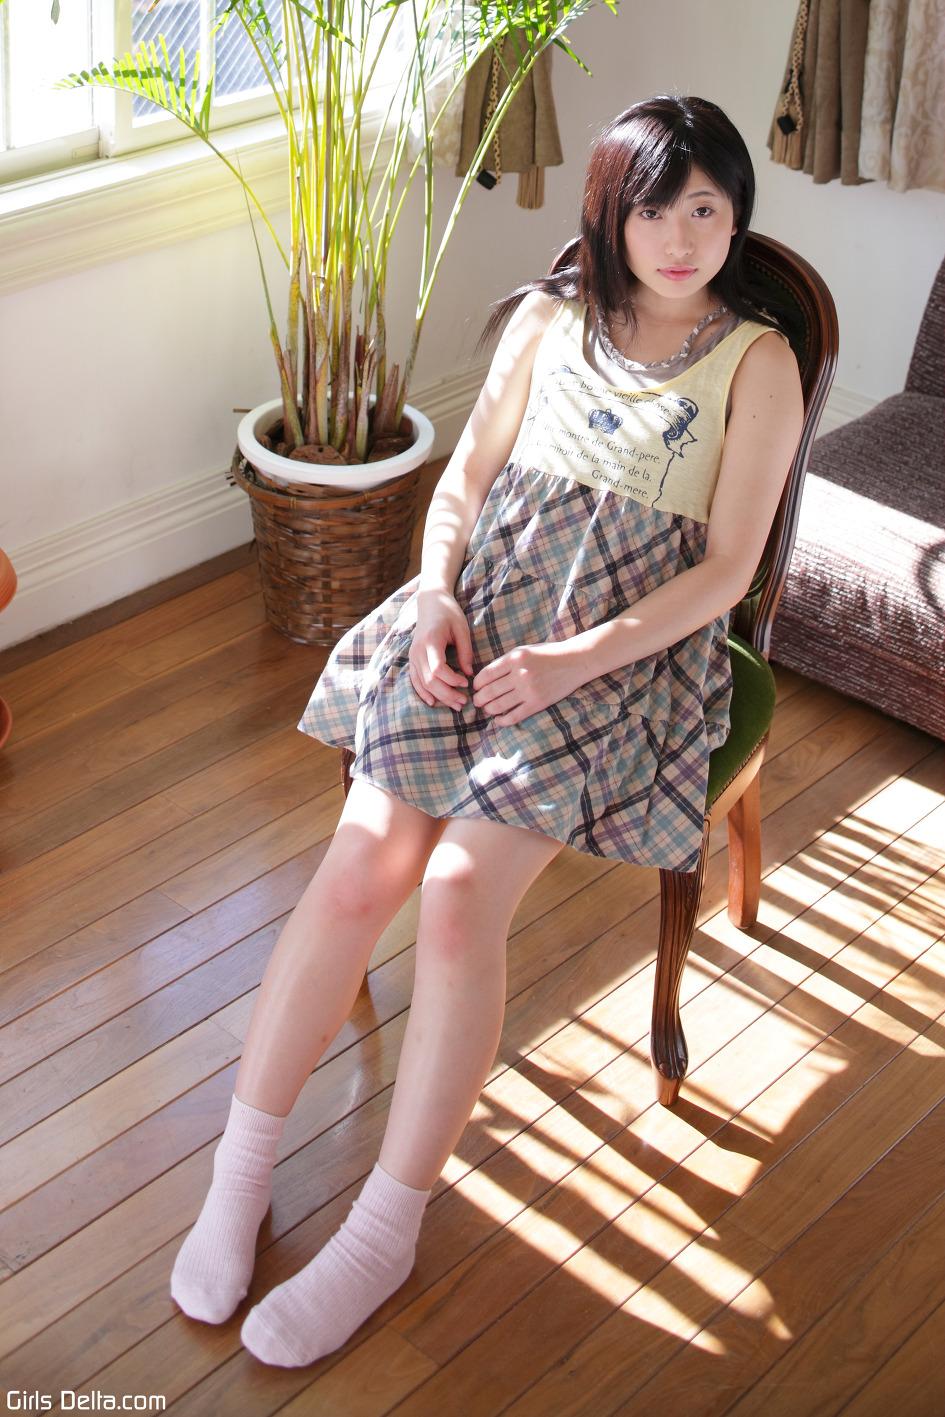 Girls Delta tsukika yoshikawa  http://blog.daum.net/ssddddd/17106216